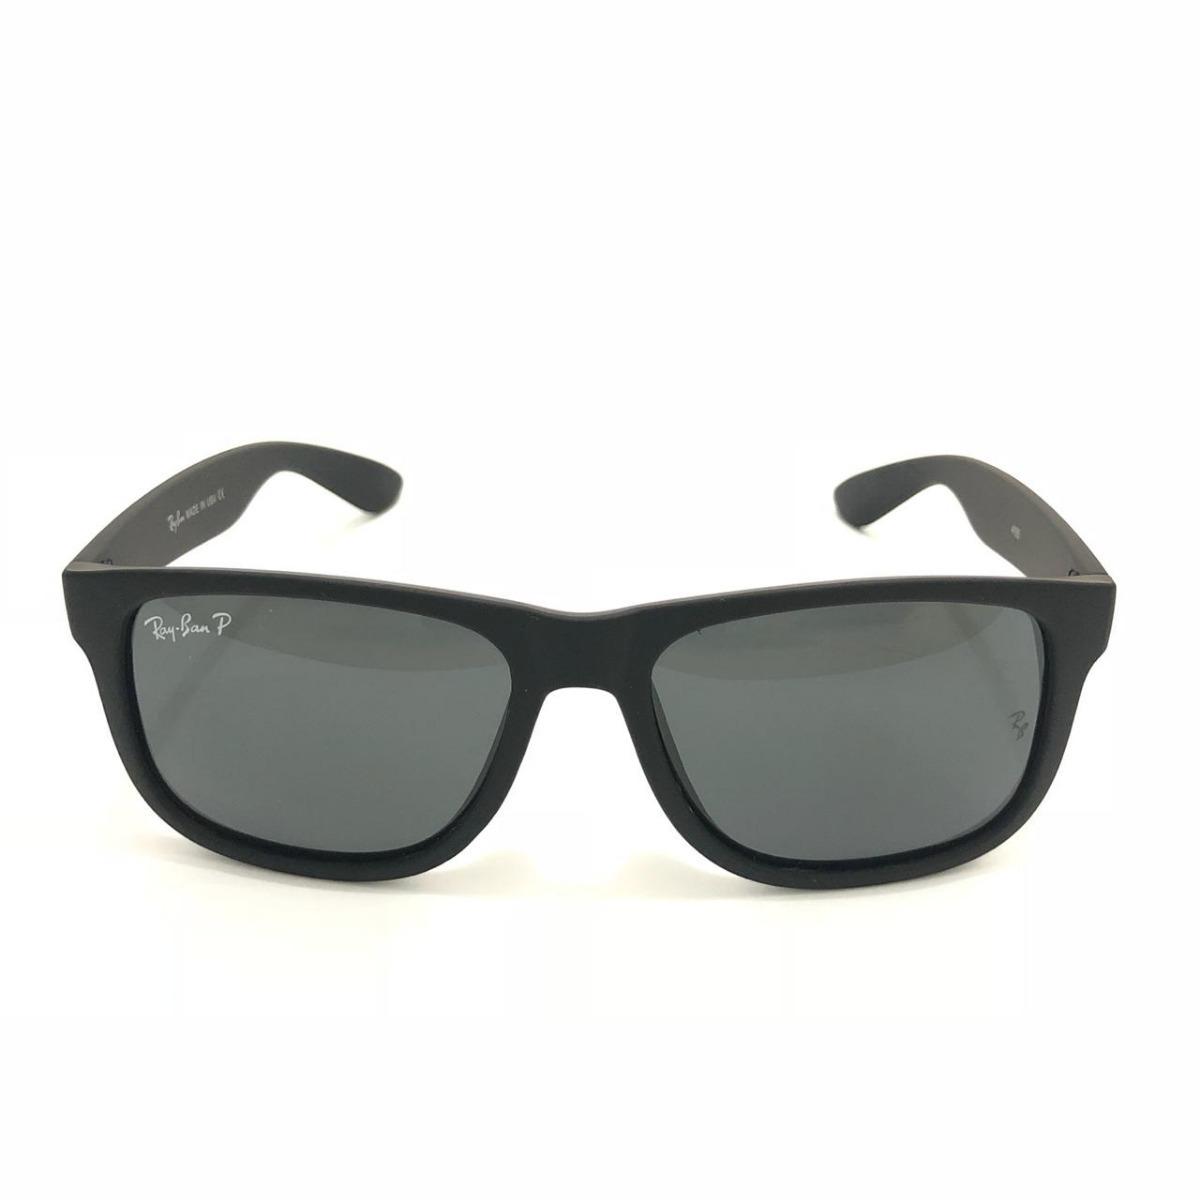 ddd92a96b oculos de sol masculino justin ray ban polarizado rb4165 top. Carregando  zoom.